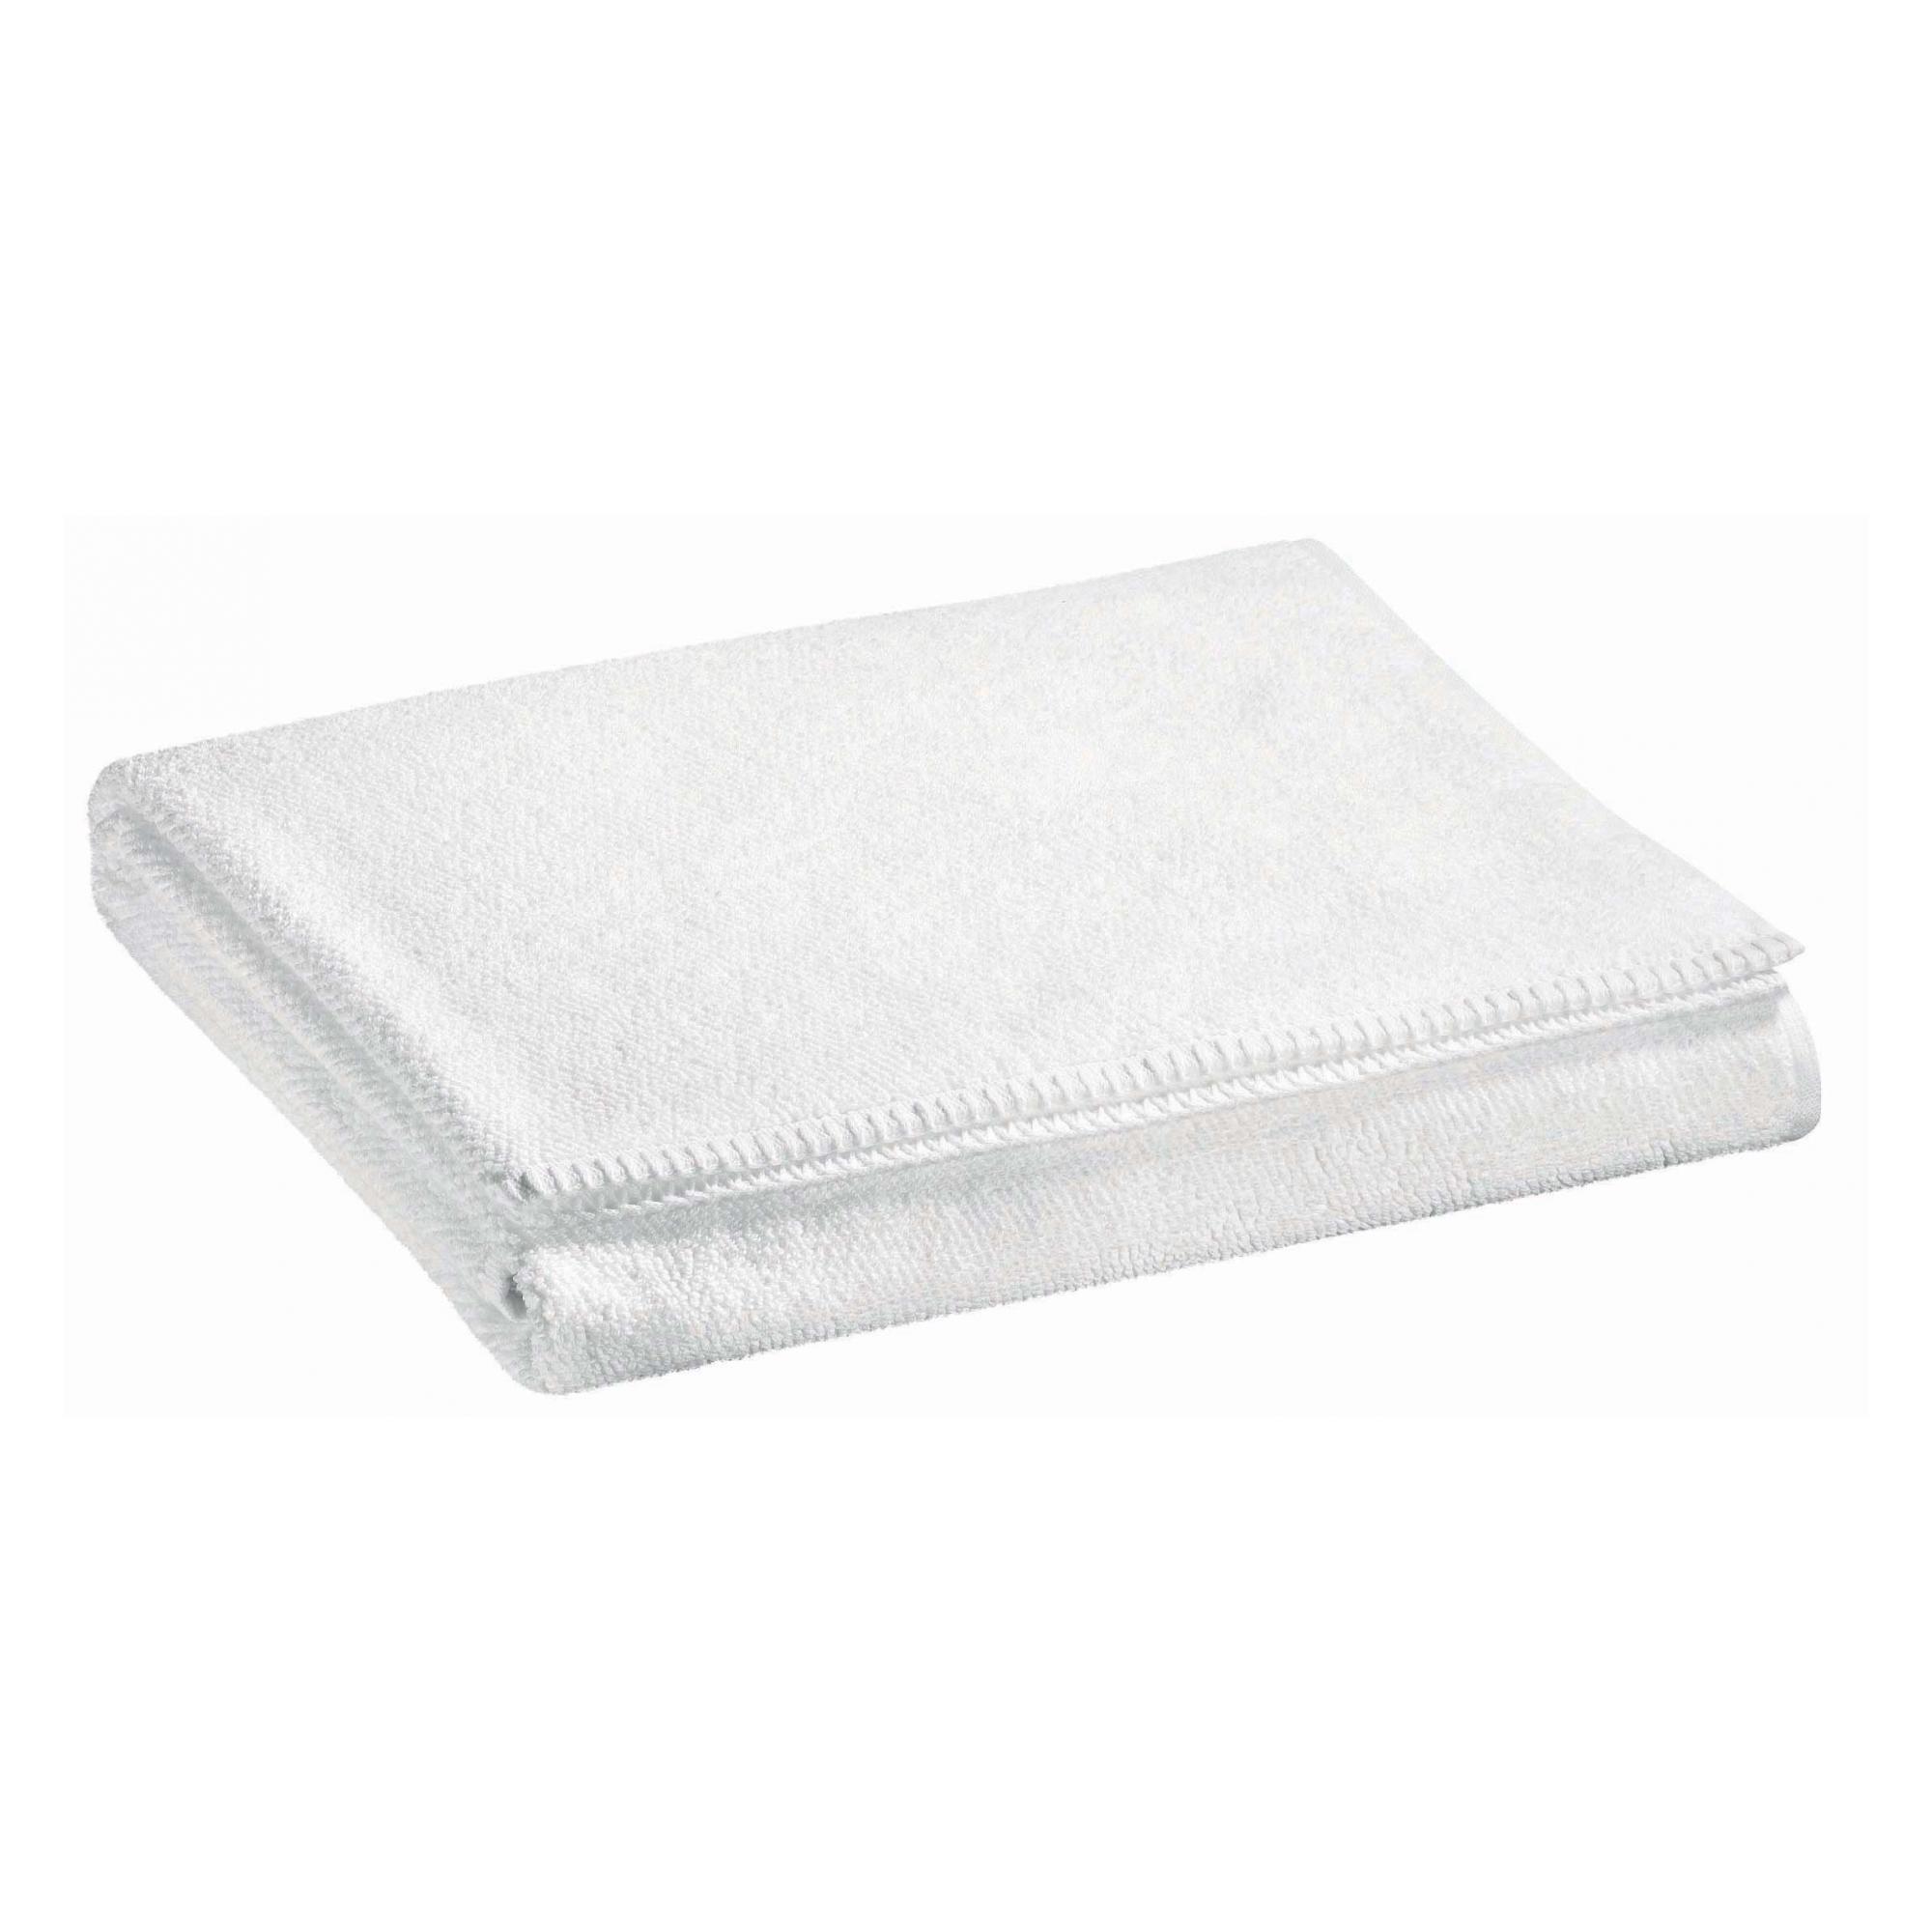 Drap de douche en coton blanc 70 x 130